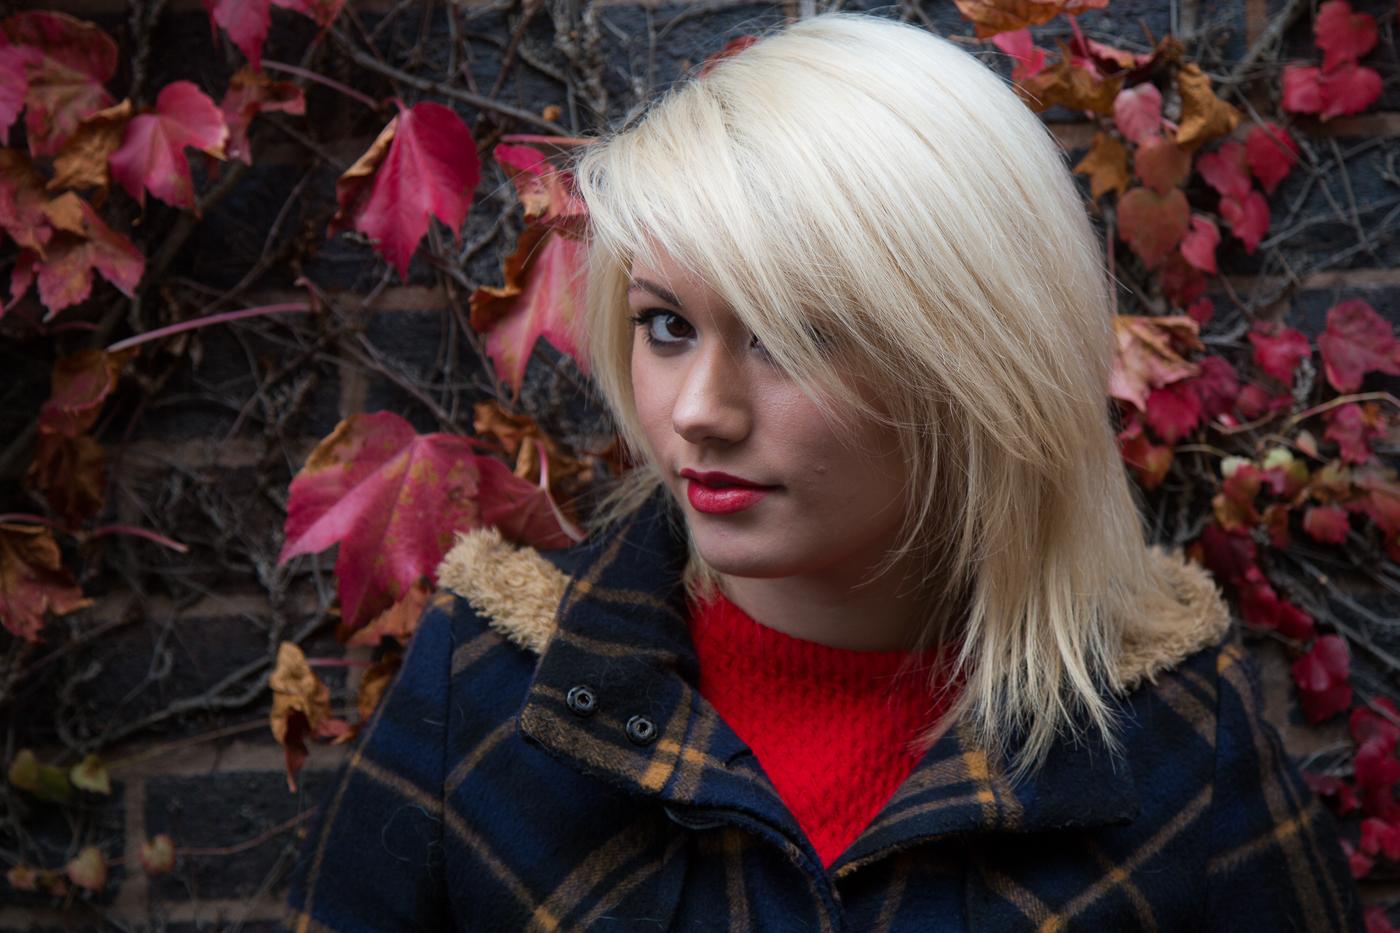 Tanya - the look